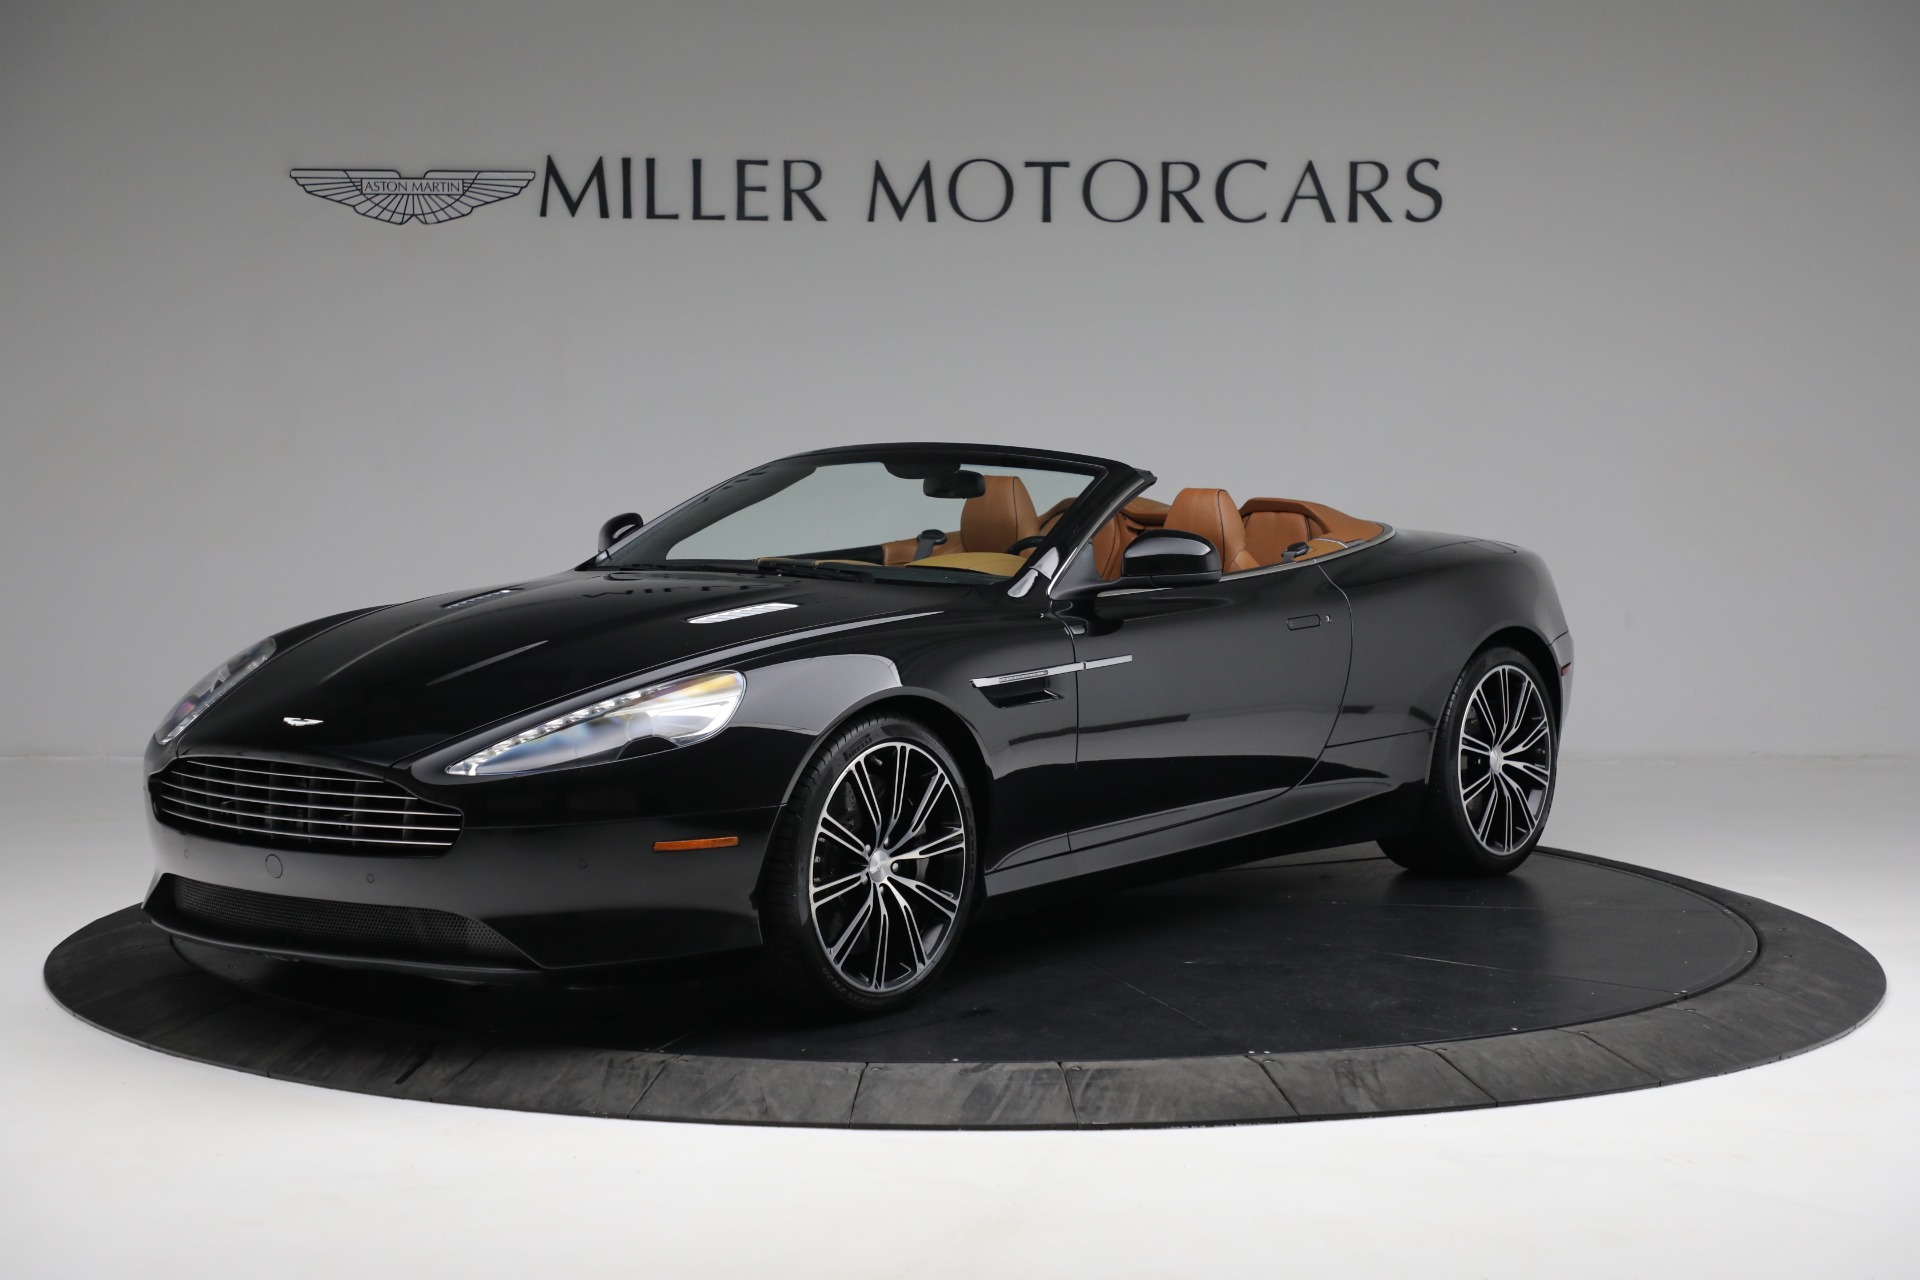 Used 2012 Aston Martin Virage Volante for sale Sold at Aston Martin of Greenwich in Greenwich CT 06830 1